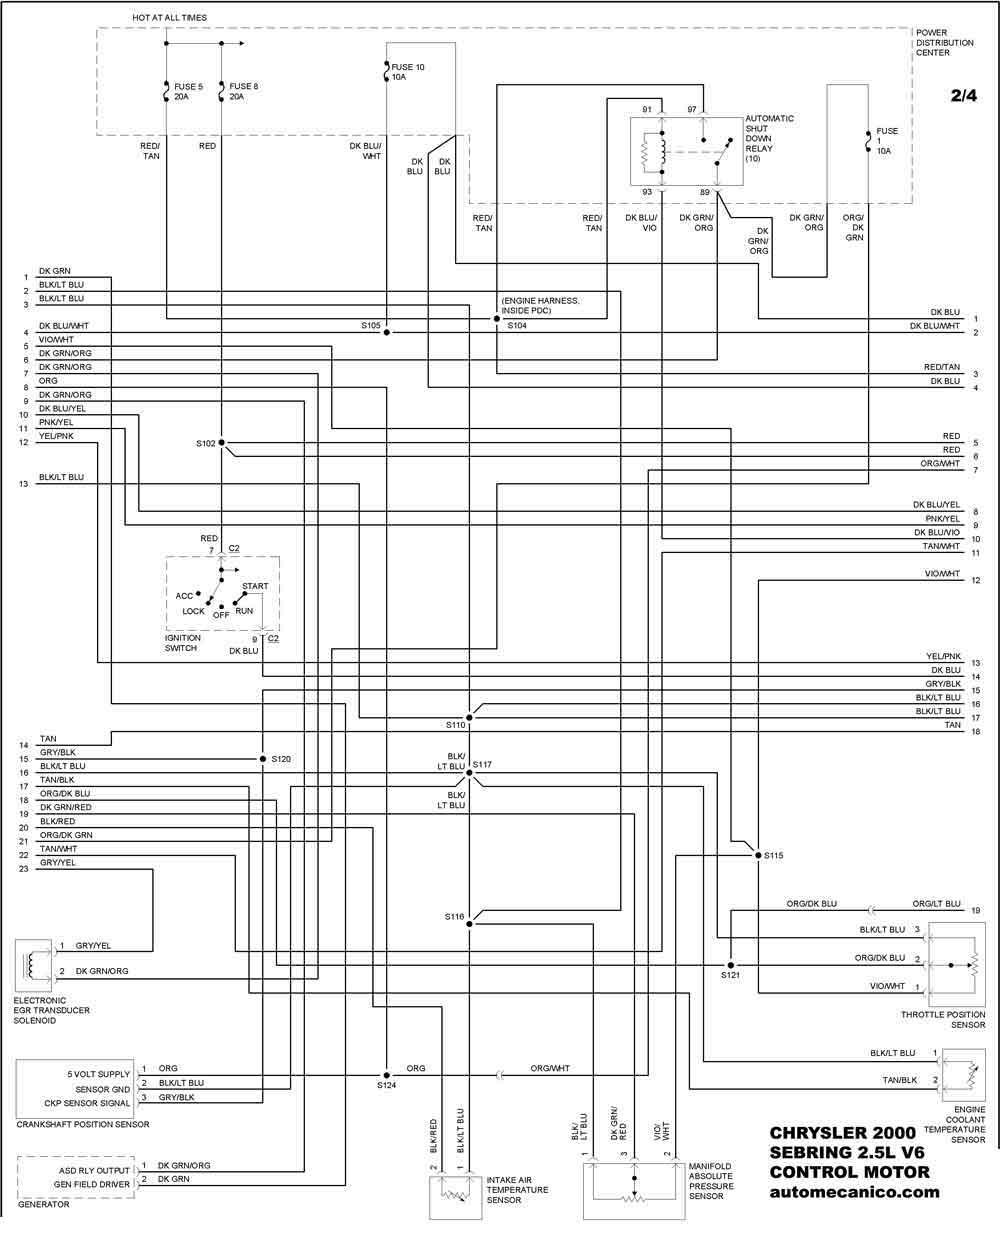 Fabulous Remington 870 Diagram Http Wwwtpubcom Gunners 67Htm Schematic Wiring Database Ioscogelartorg